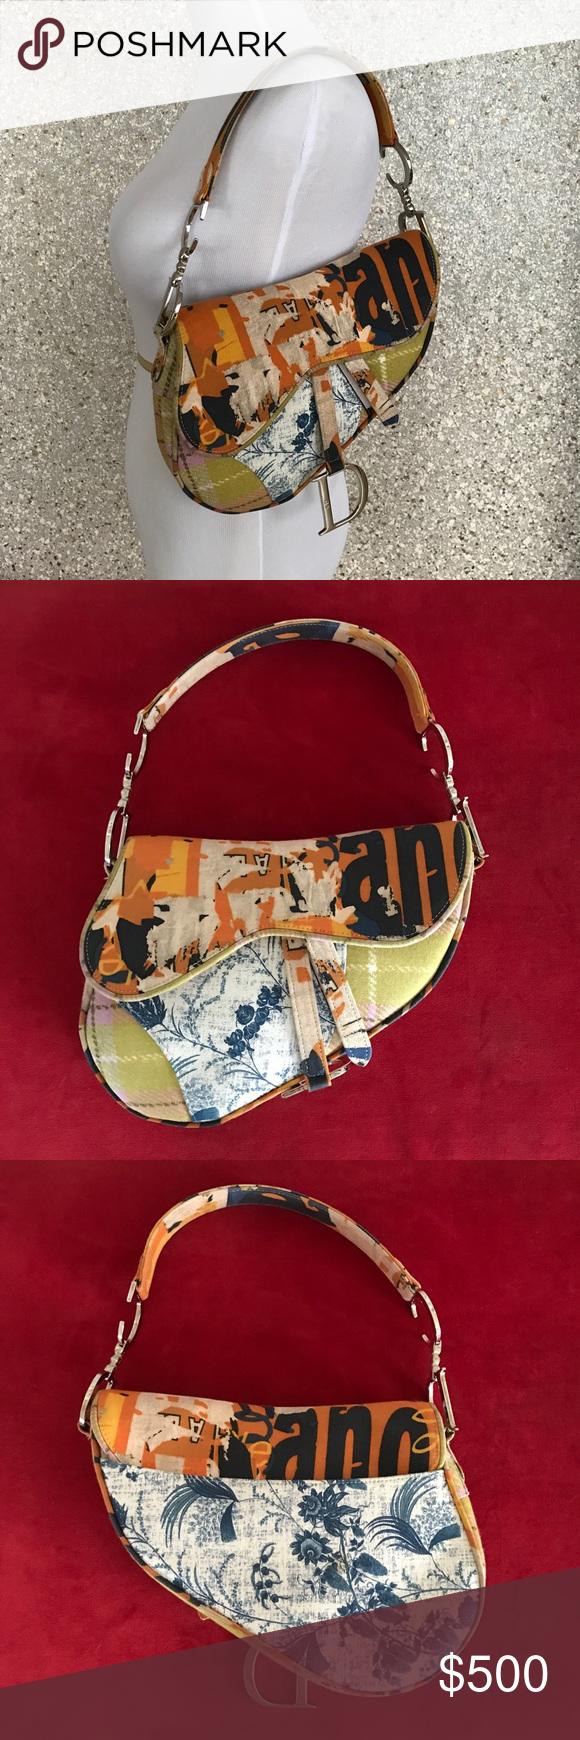 CHRISTIAN DIOR LIMITED EDITION CANVAS SADDLE BAG Rare Limited Edition